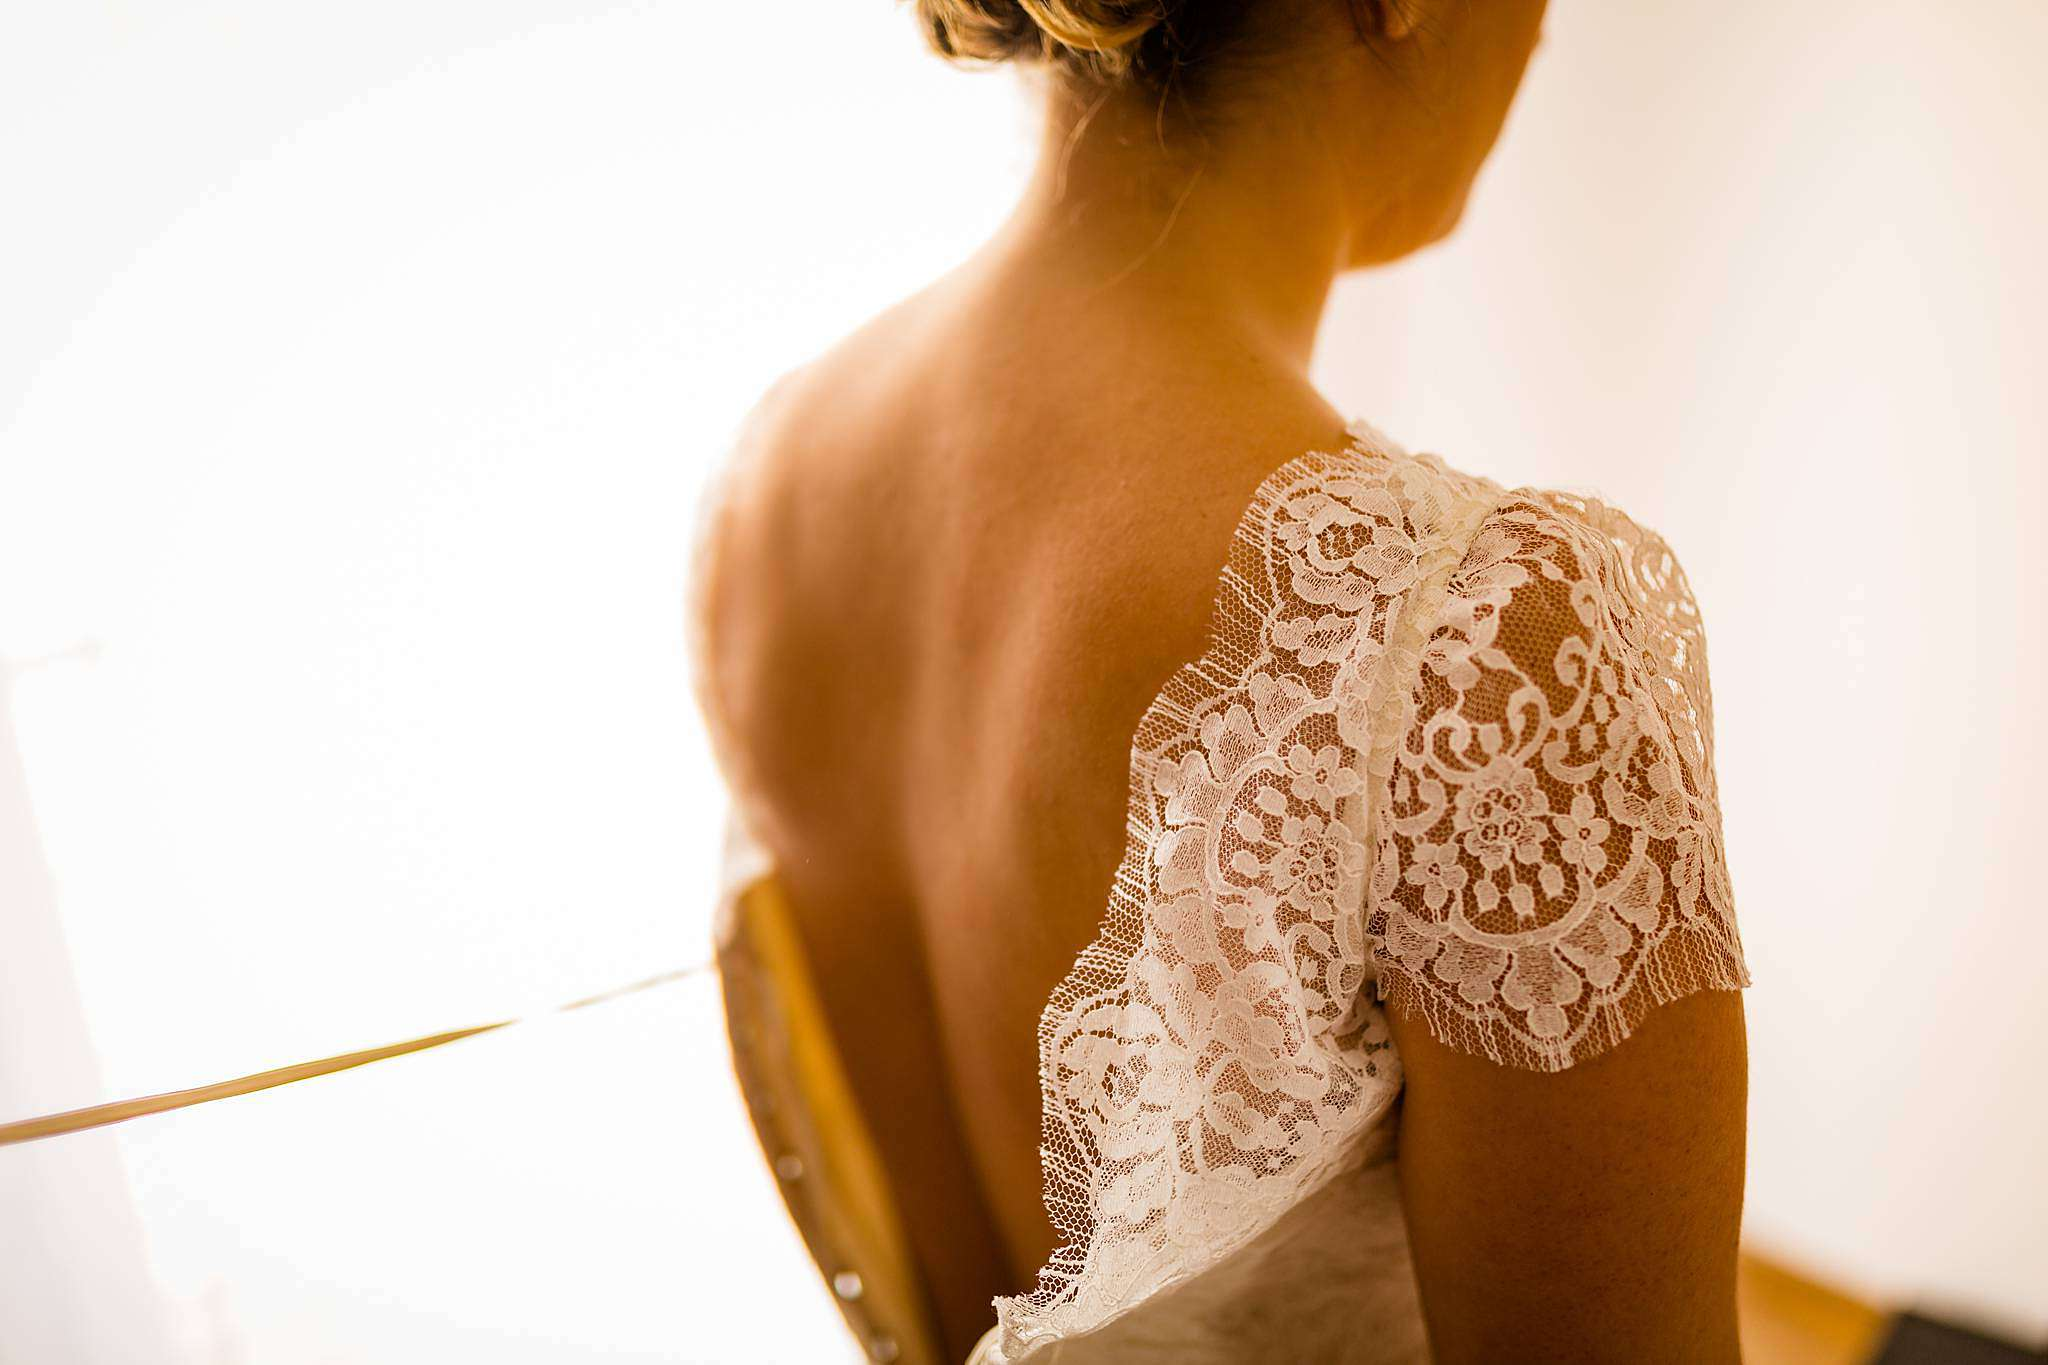 Robe de mariage Confidentiel Création à Eysines Gironde